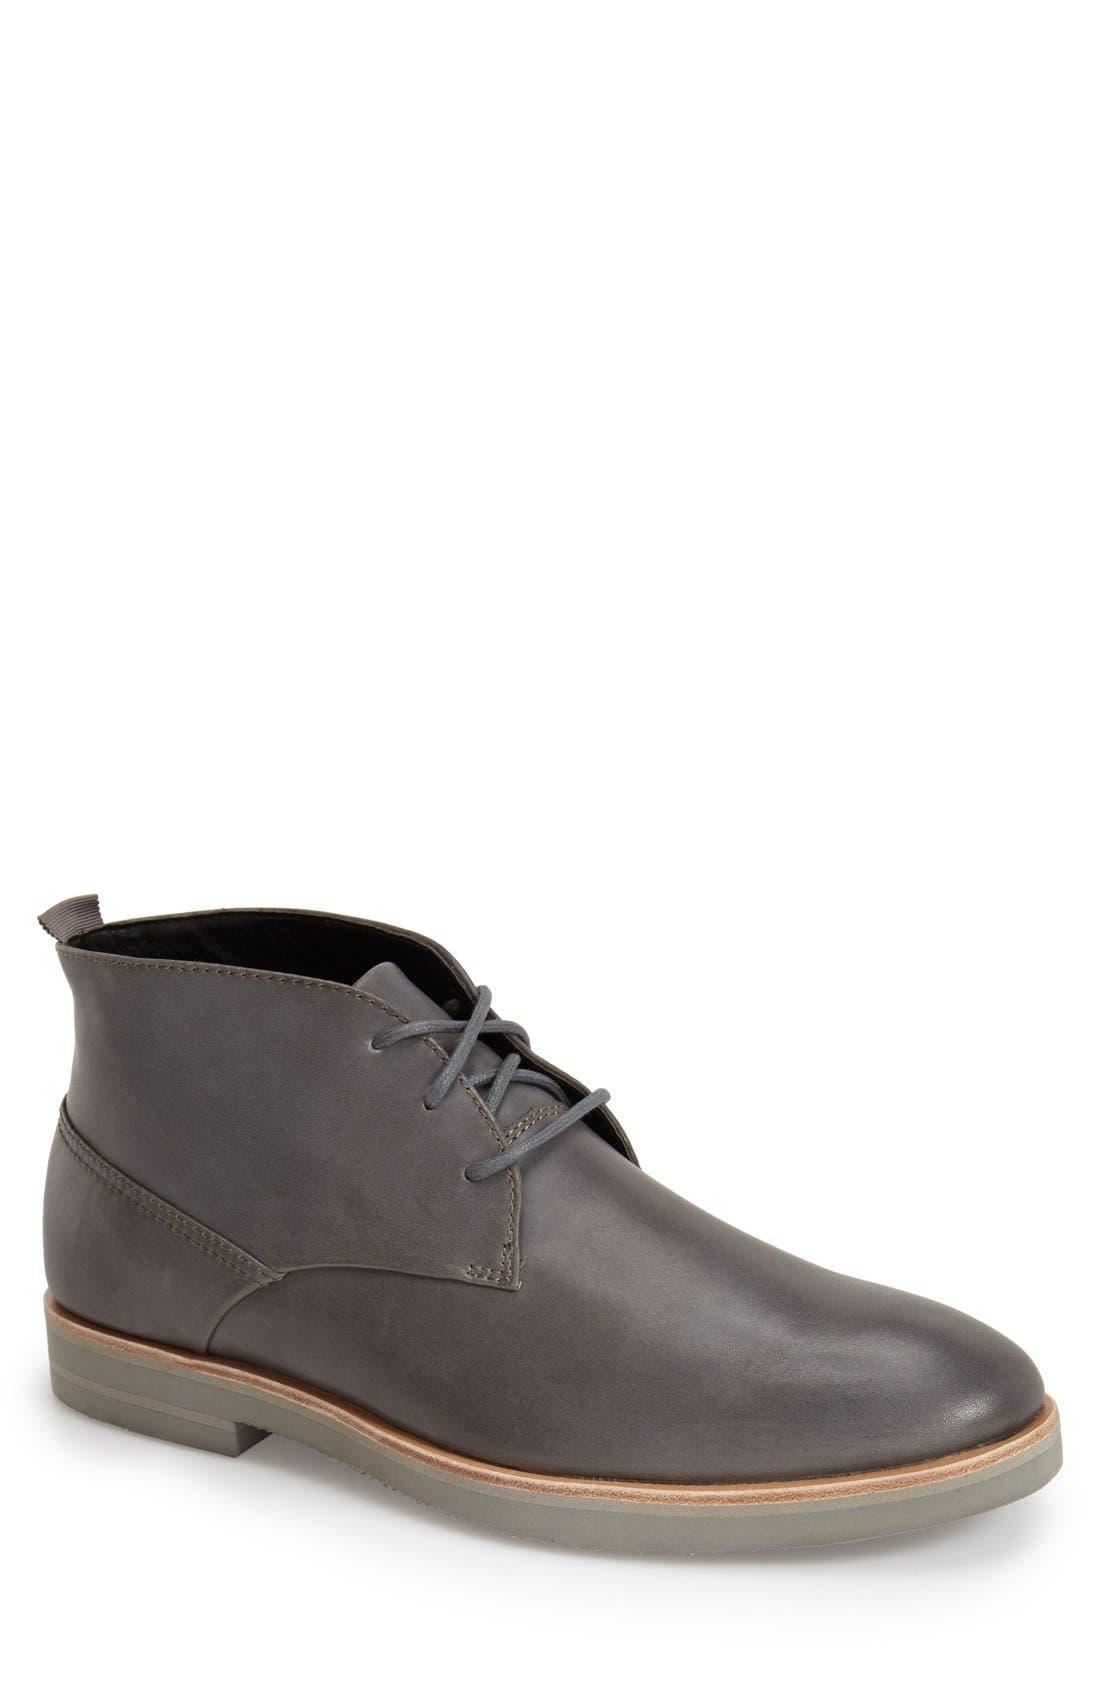 Main Image - Calvin Klein 'Walter' Chukka Boot (Men)